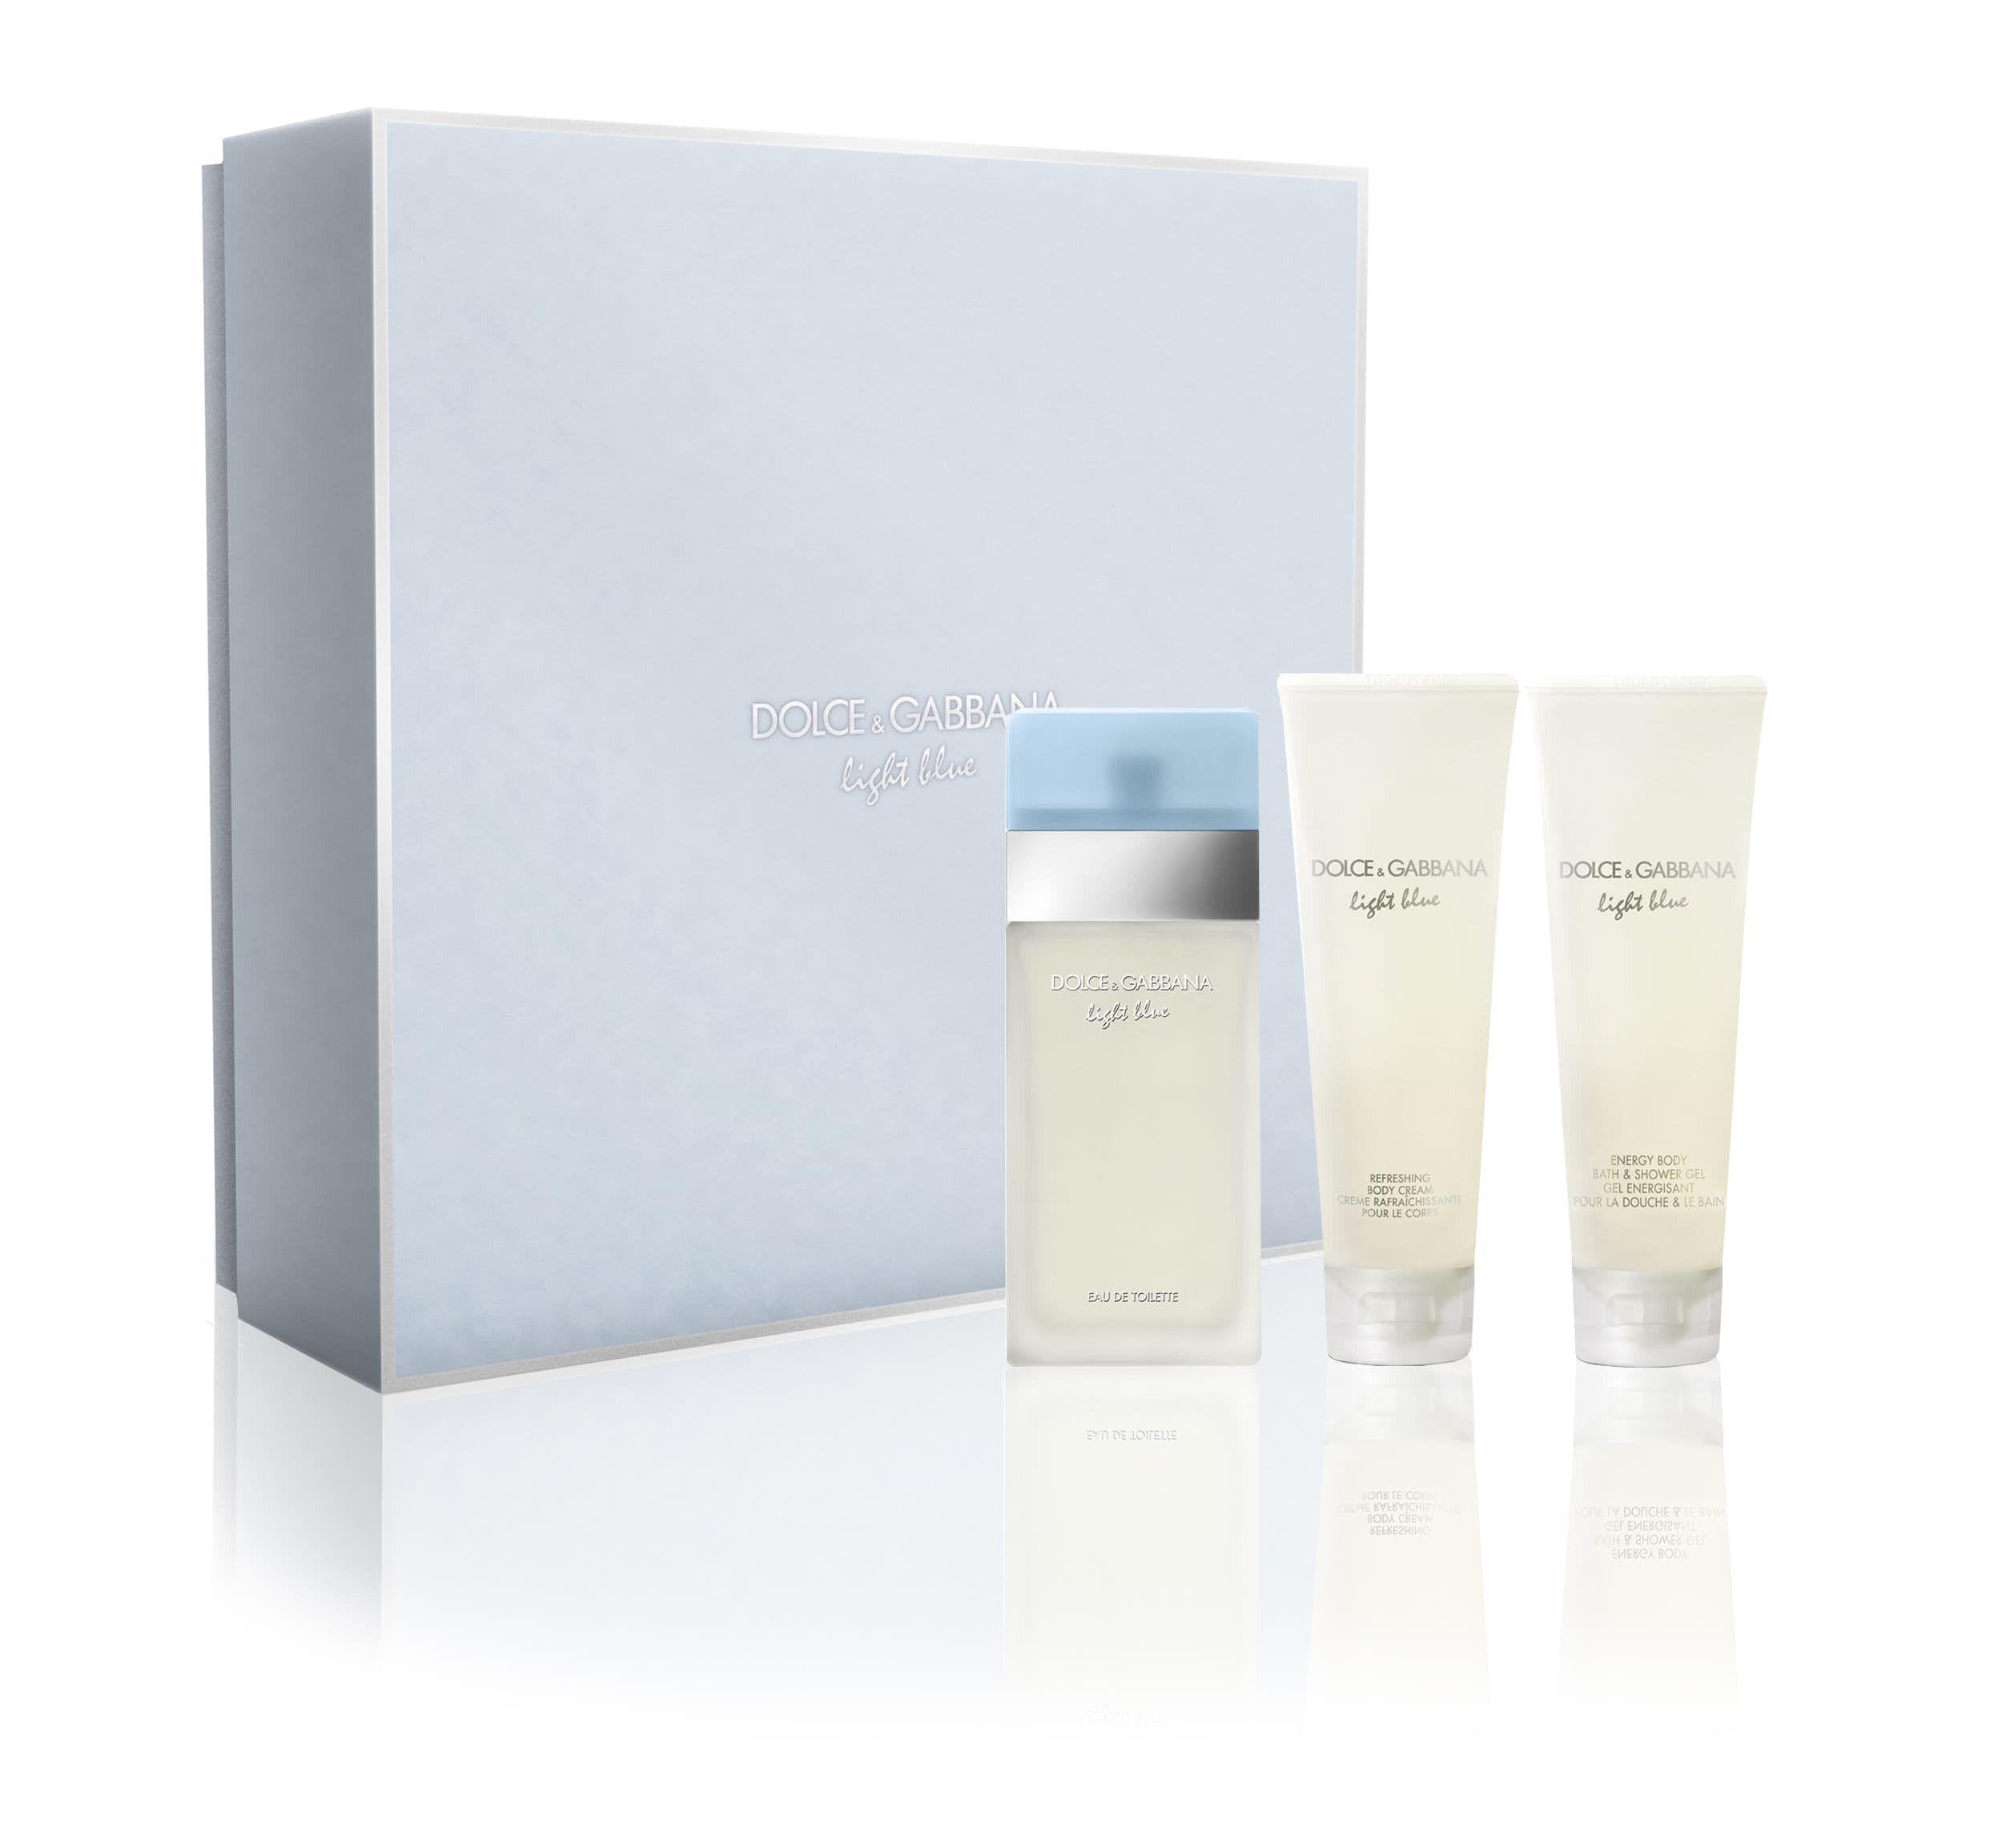 Dolce And Gabbana Light Blue Eau De Toilette Spray 50Ml And Shower Gel 50Ml